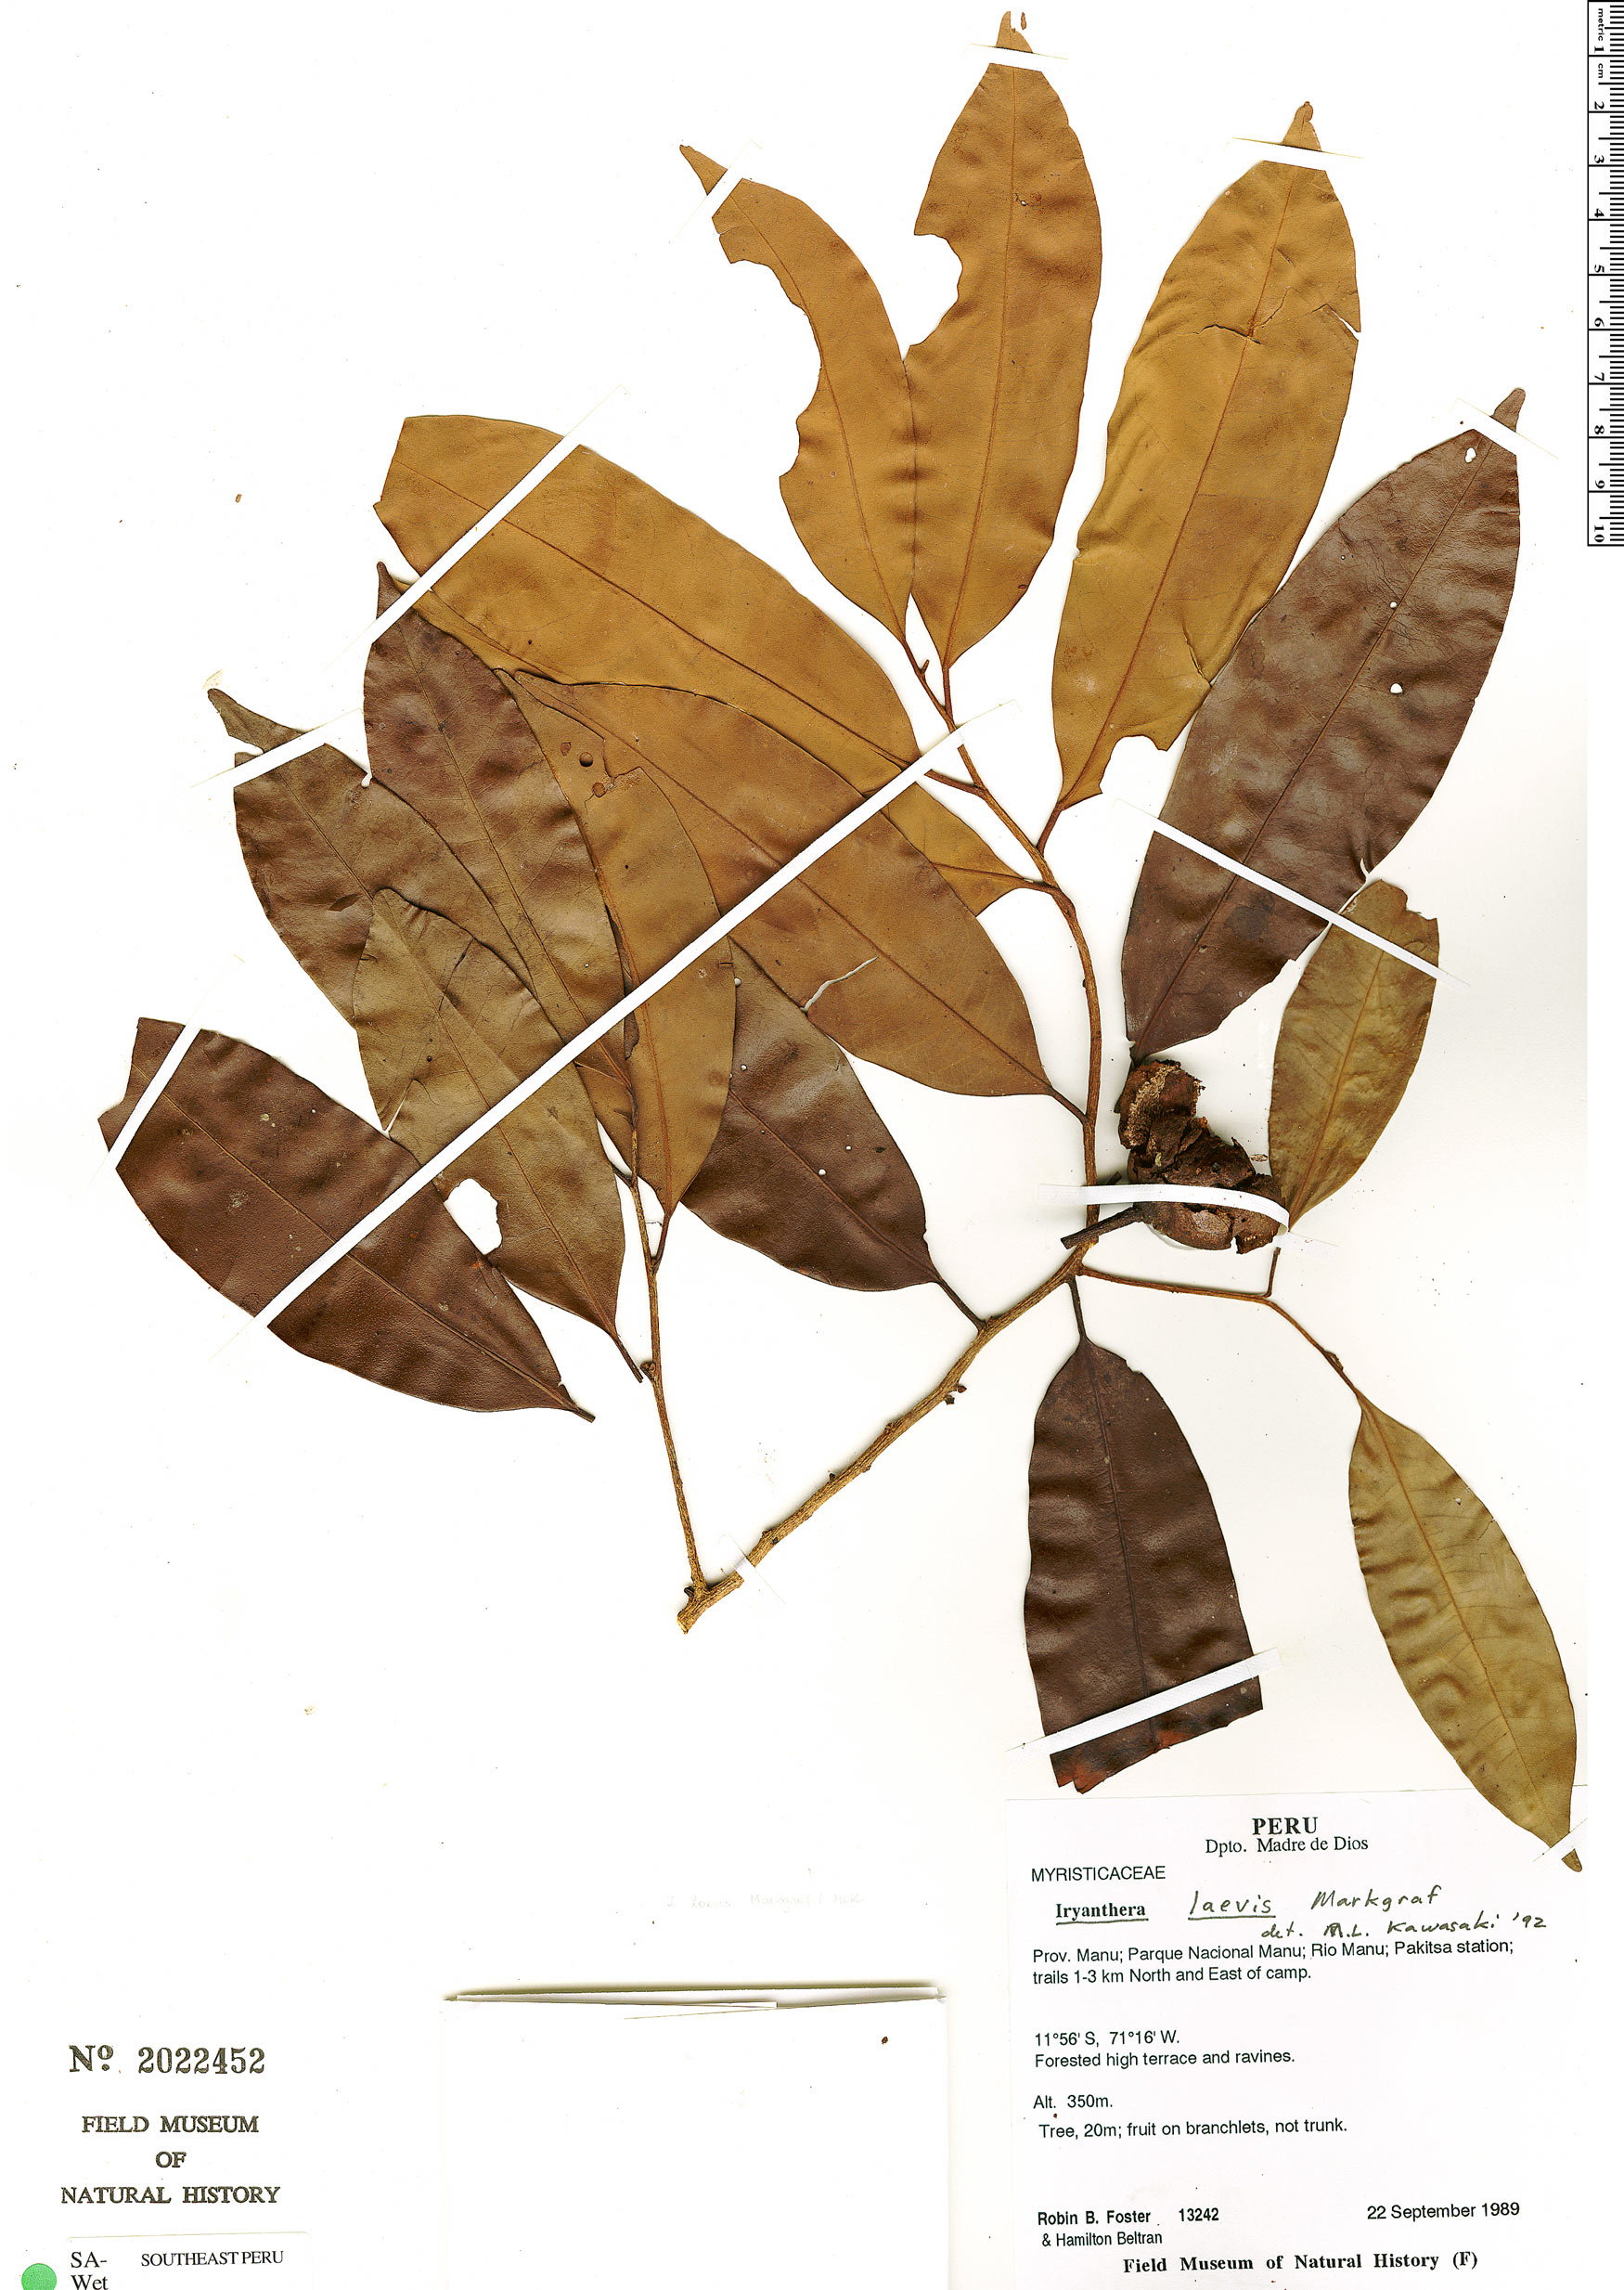 Specimen: Iryanthera laevis